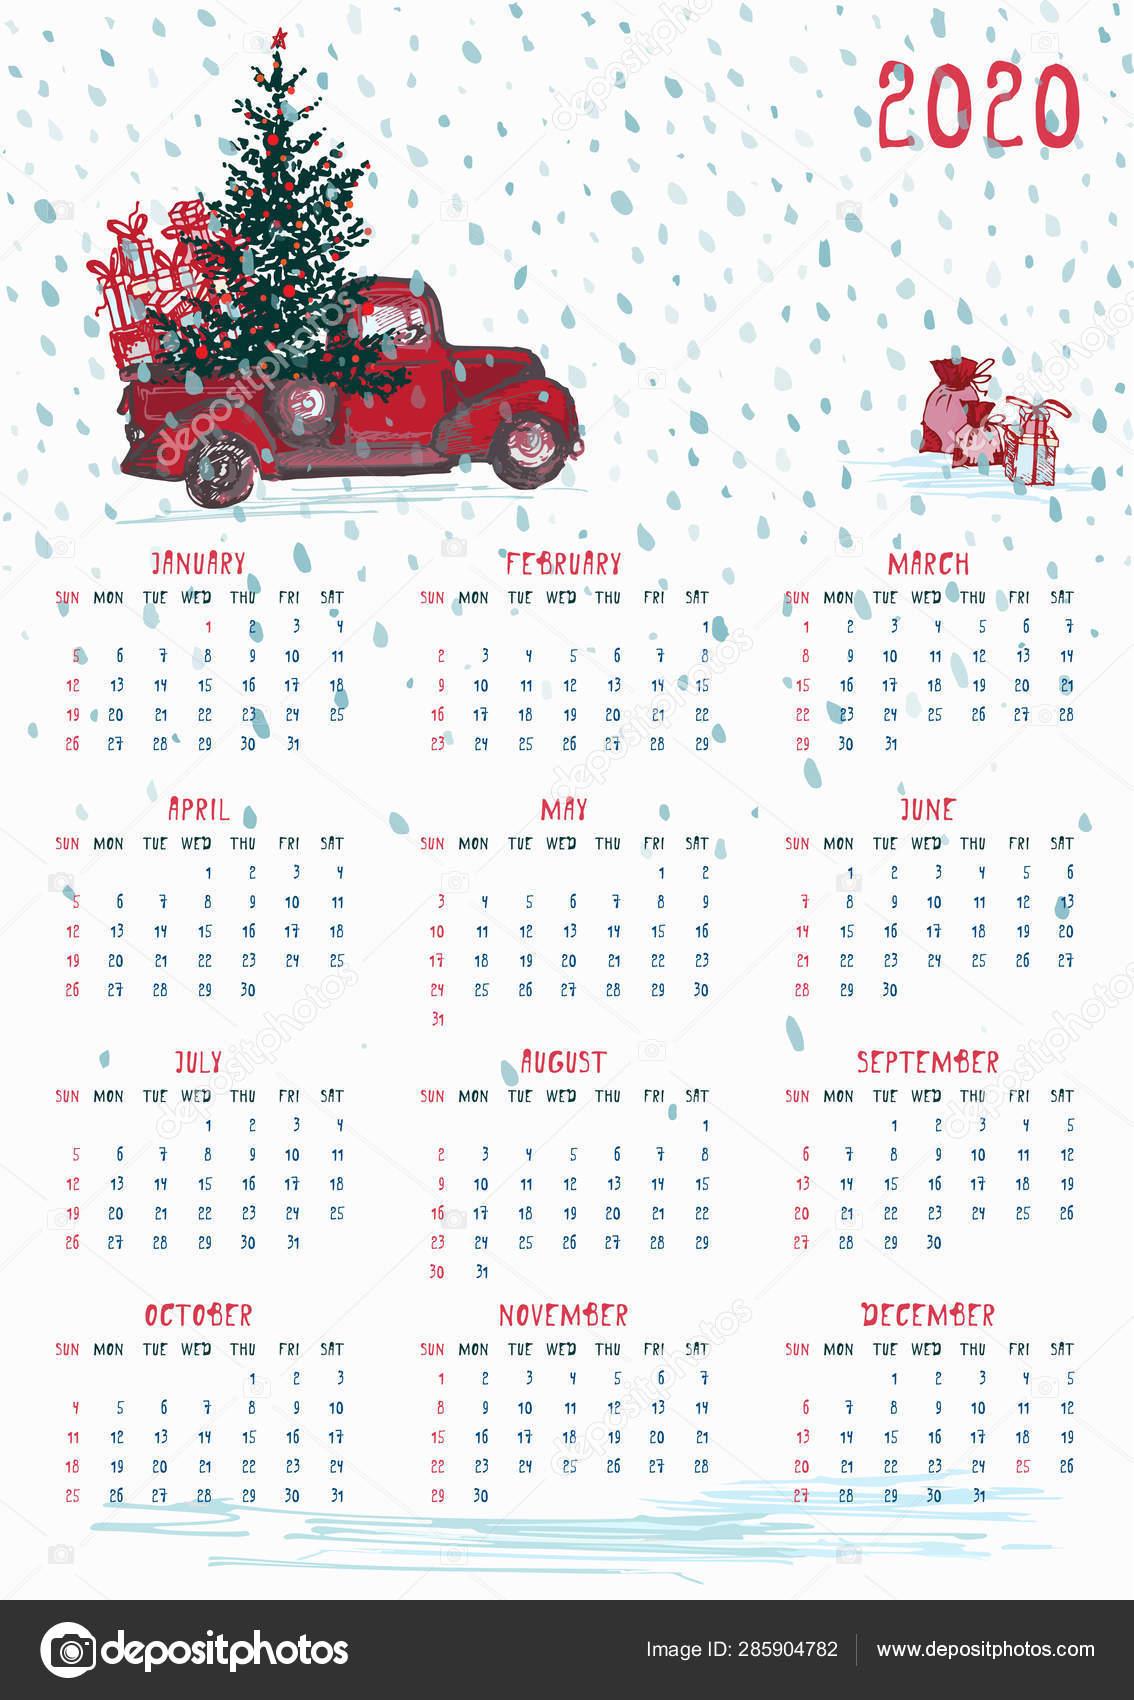 Calendario Laboral 2020 Galicia Doga.Calendario De Navidad 2020